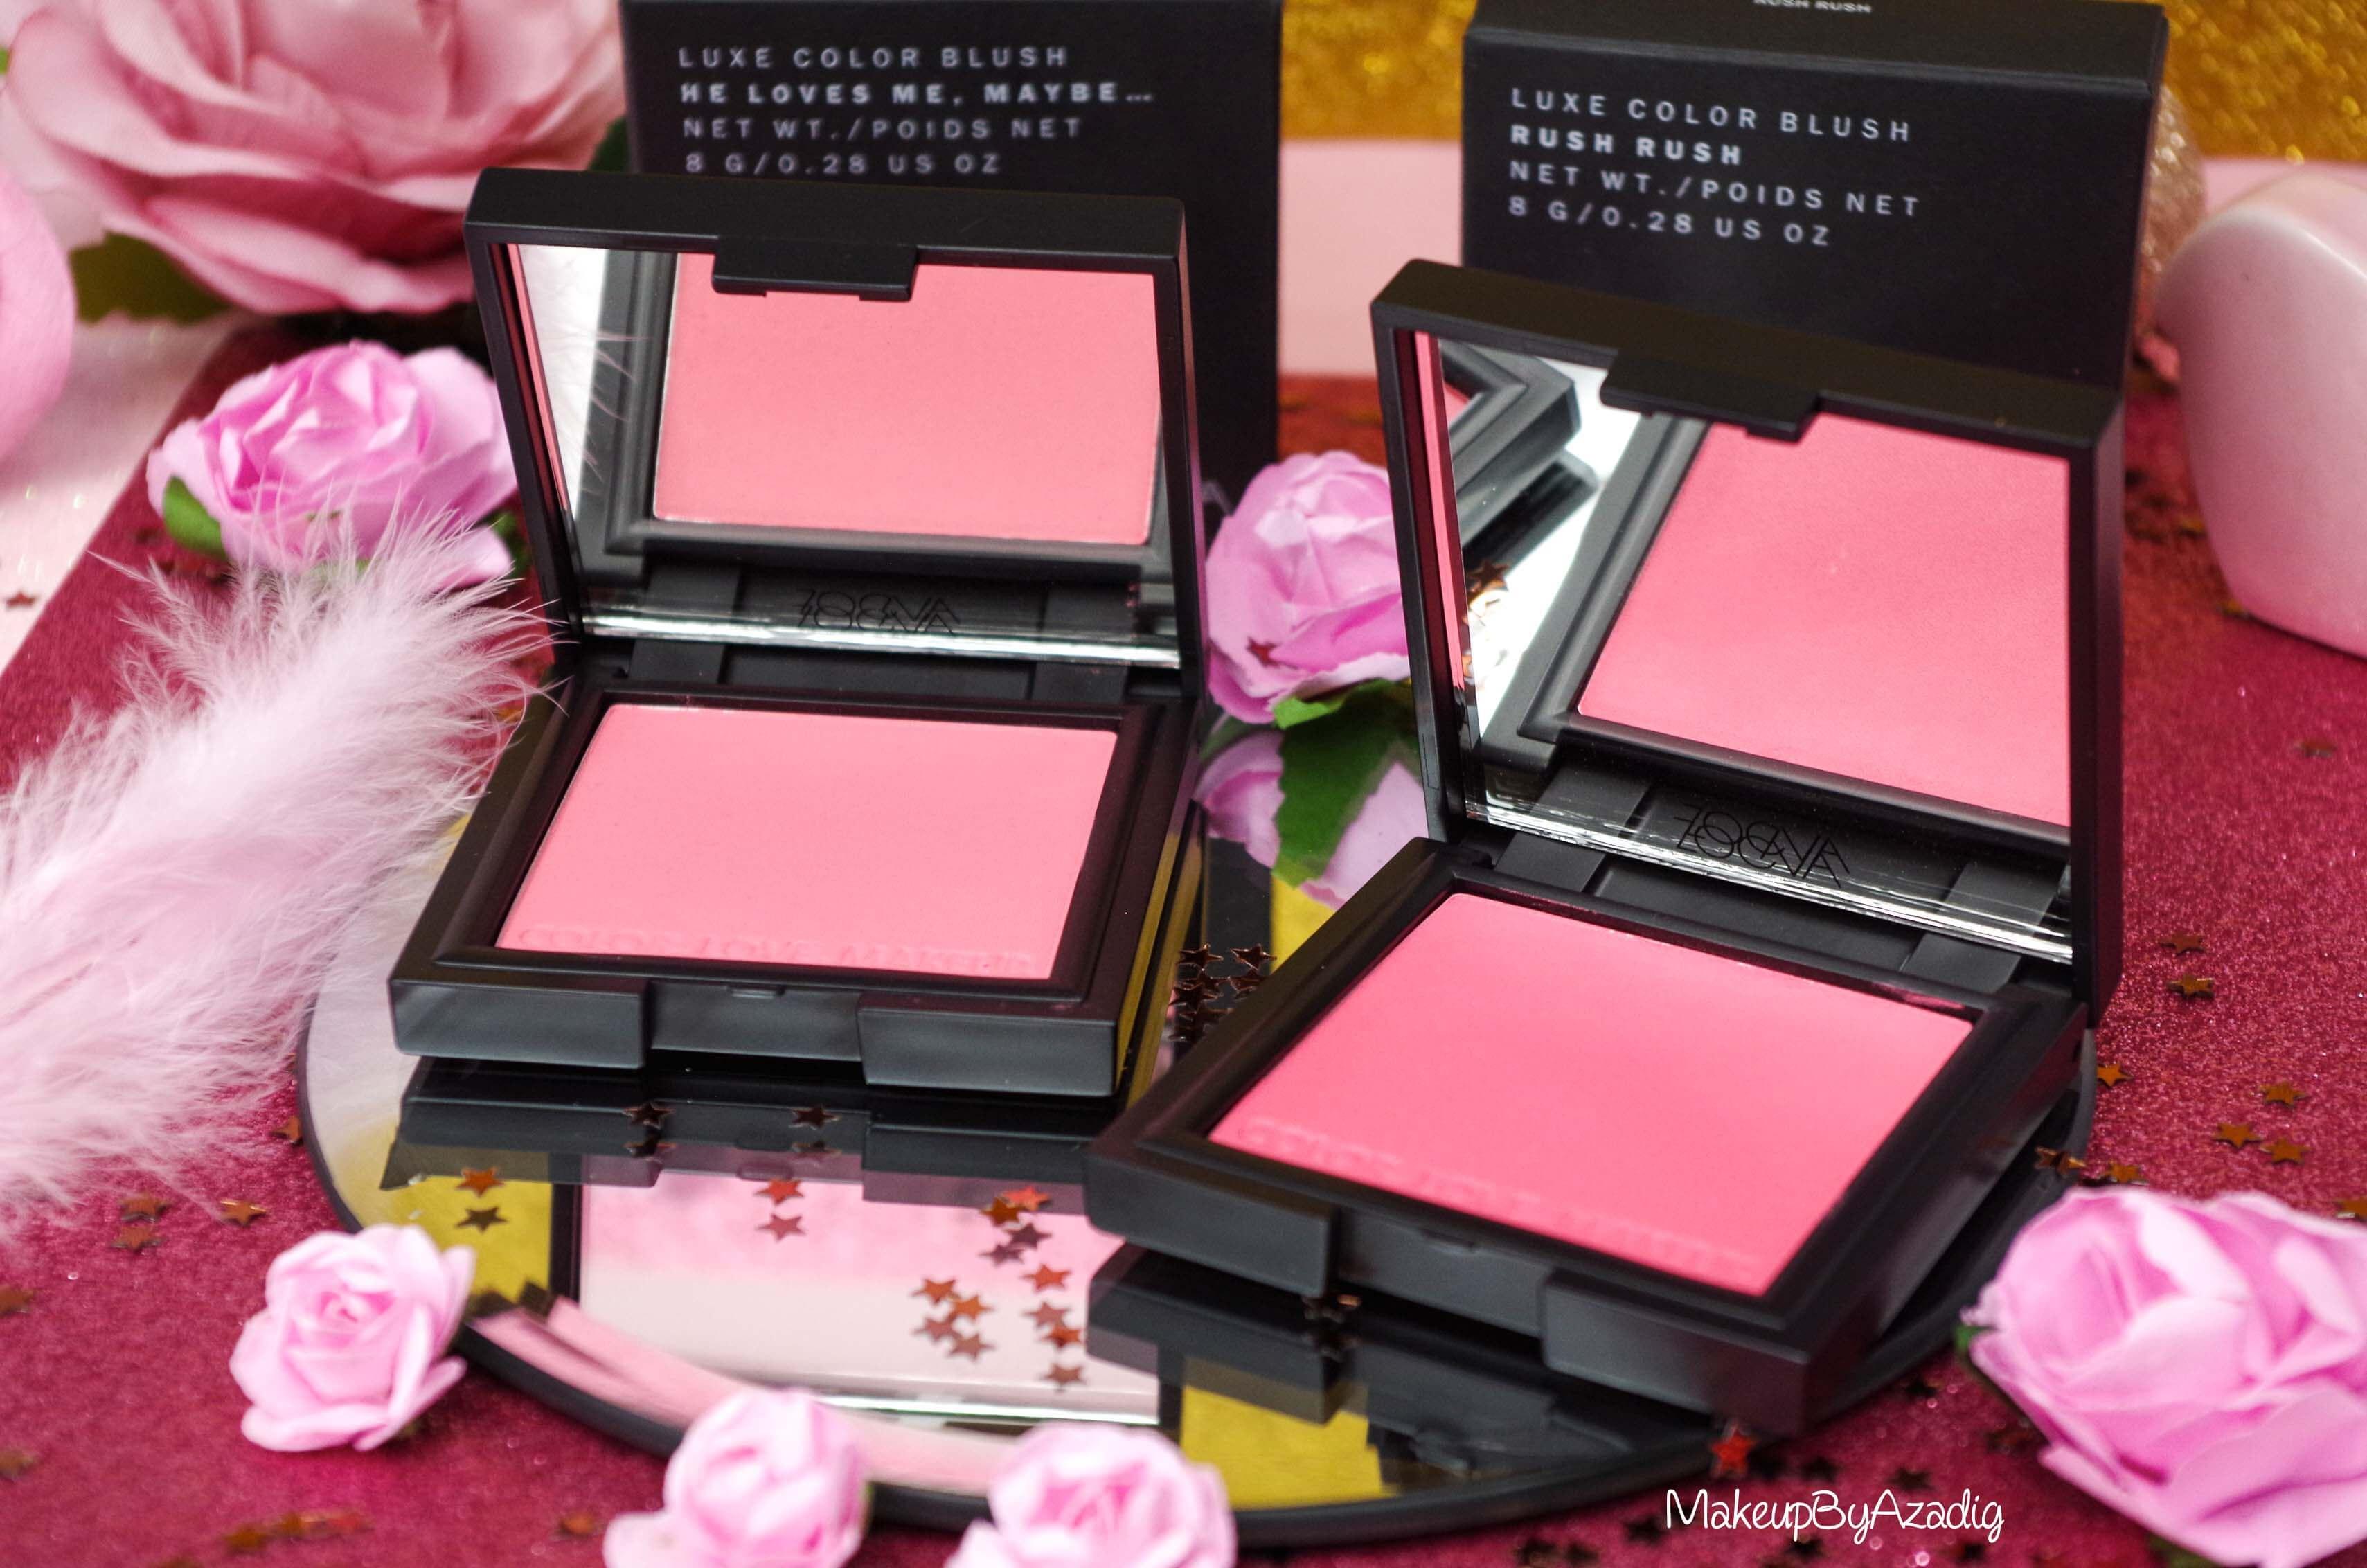 revue-review-luxe-color-blush-zoeva-sephora-france-helovesmemaybe-rush-rush-avis-swatch-makeupbyazadig-paris-miniature